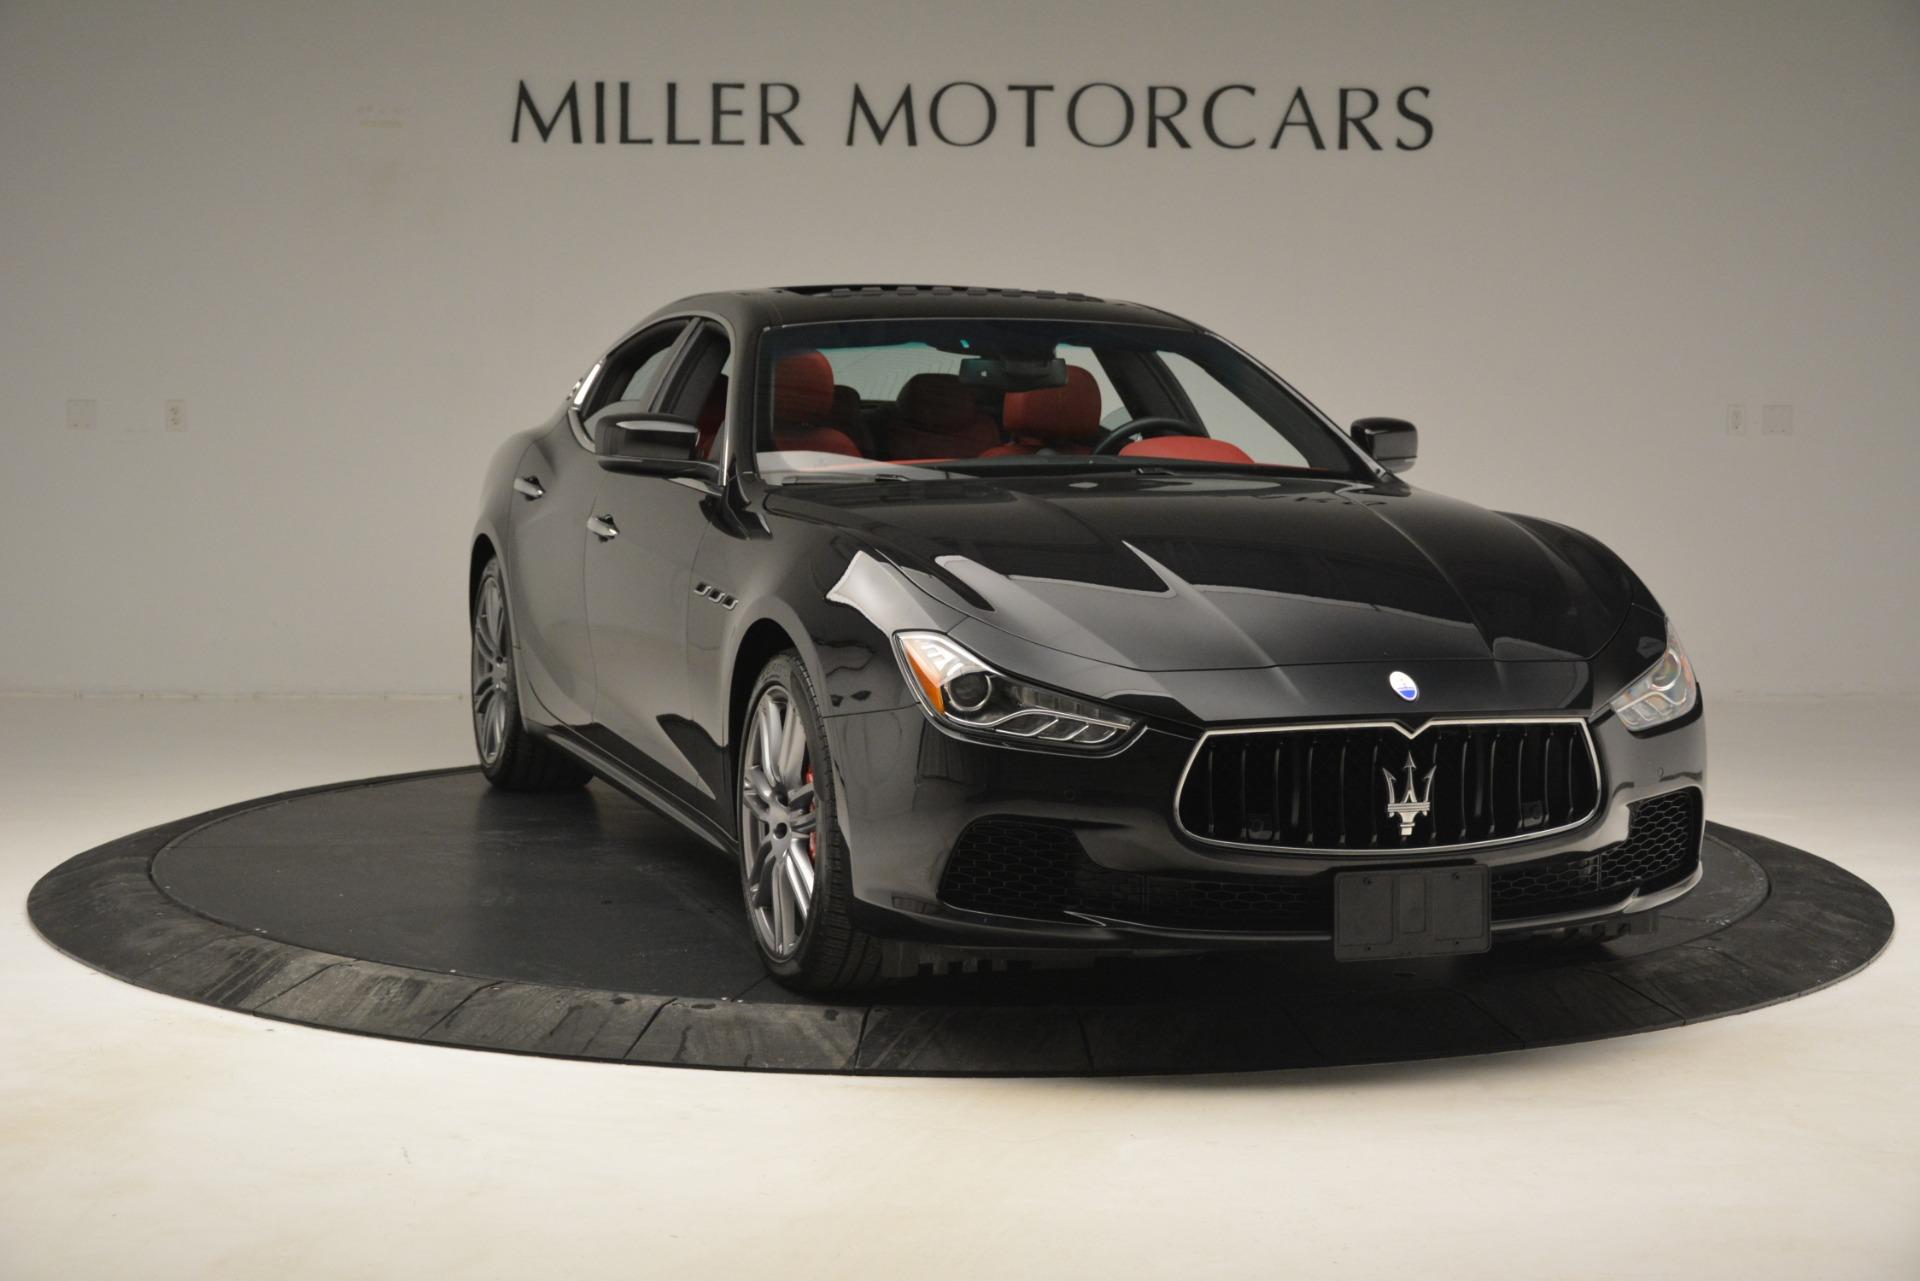 Used 2016 Maserati Ghibli S Q4 For Sale In Greenwich, CT 2945_p14